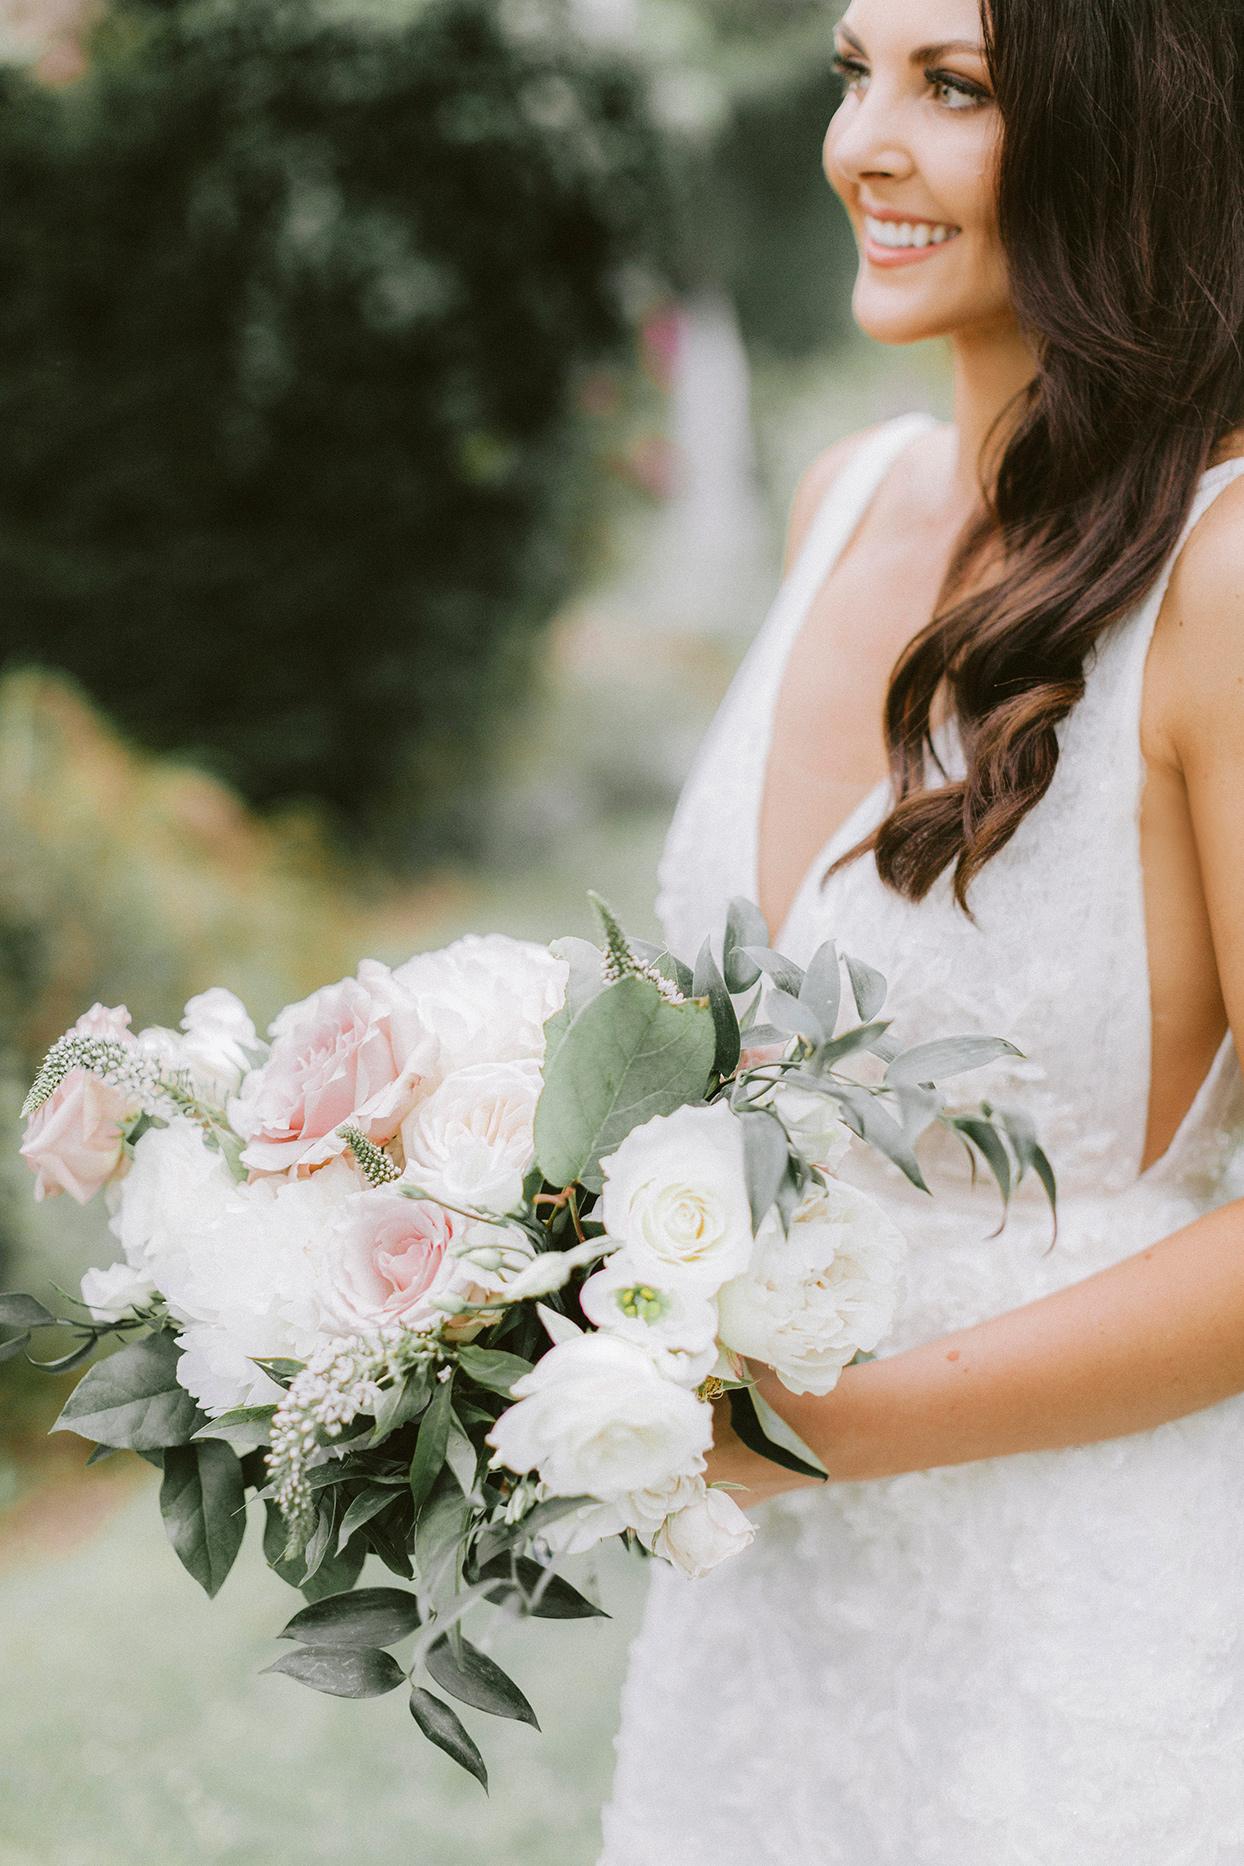 bride holding pastel floral wedding bouquet